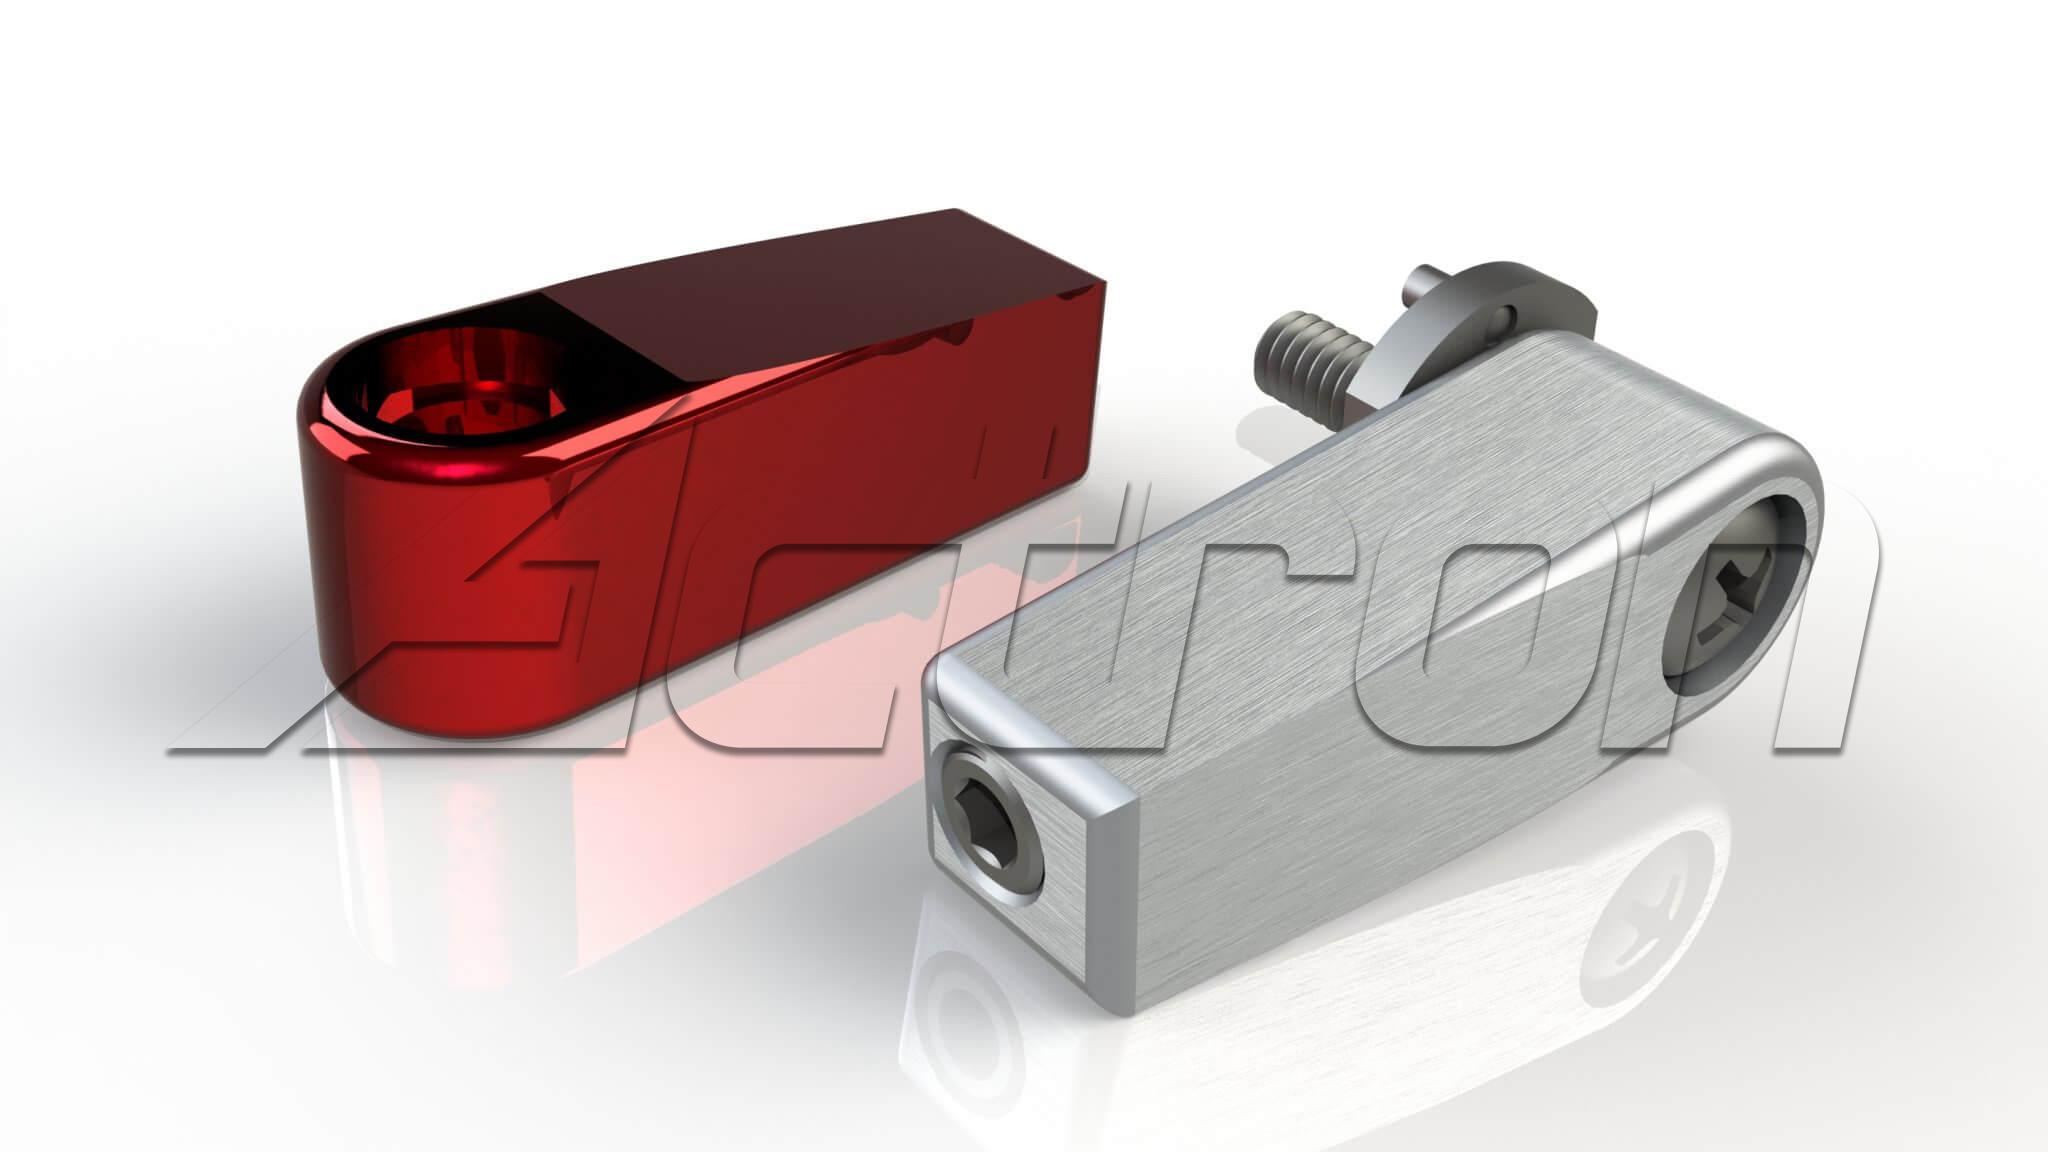 1-4-turn-retainer-5345-a35588.jpg